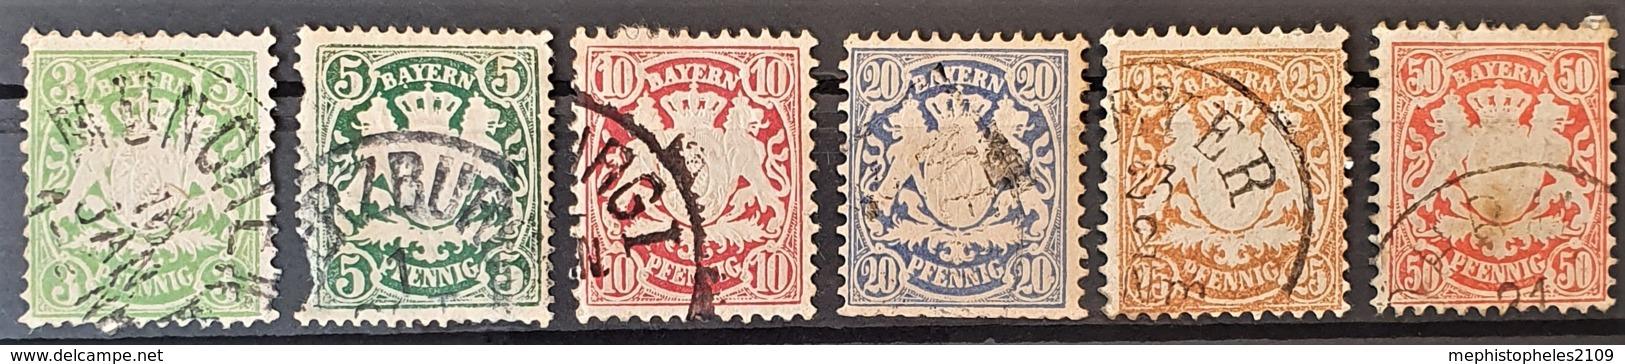 BAYERN / BAVARIA 1876 - Canceled - Mi 37-42 - Complete Set! - 38 Damaged On Lower Left Edge! - Bayern